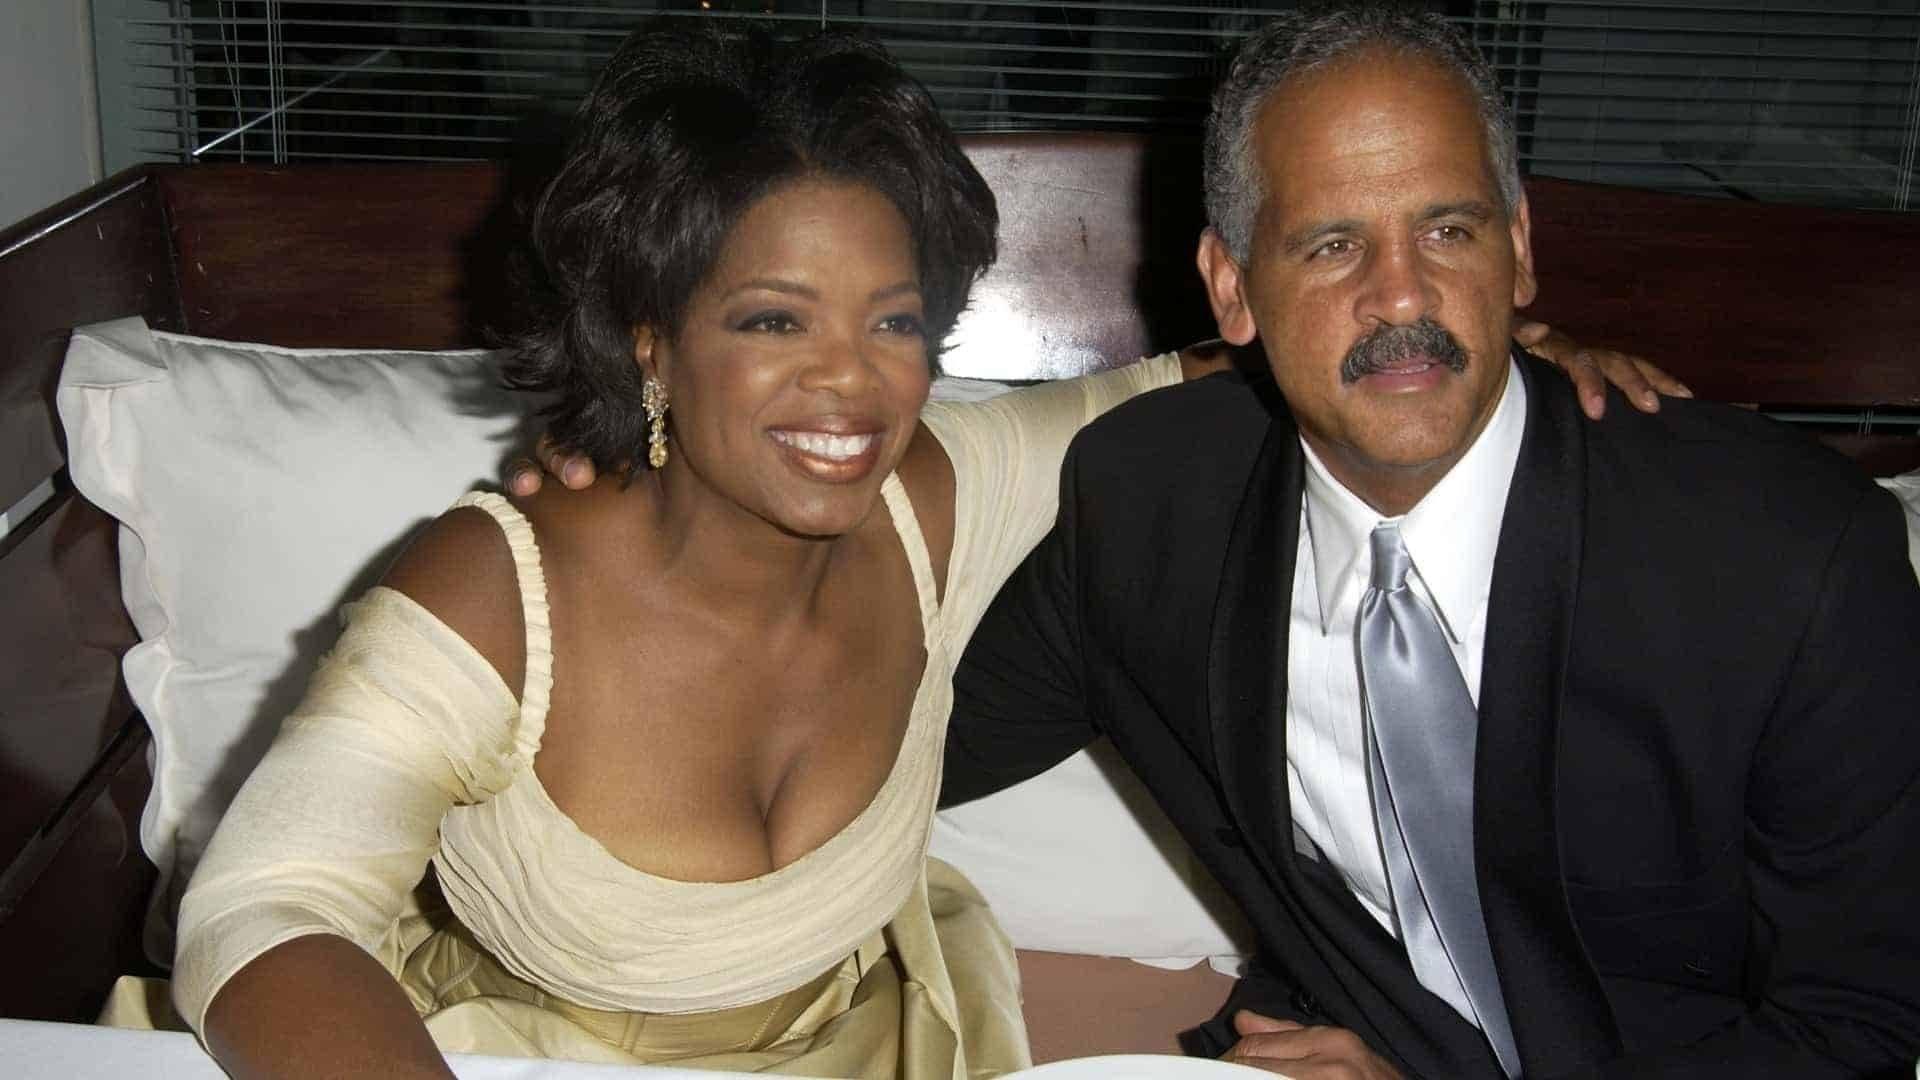 The Real Reason Oprah Winfrey Isn't Married To Stedman Graham!